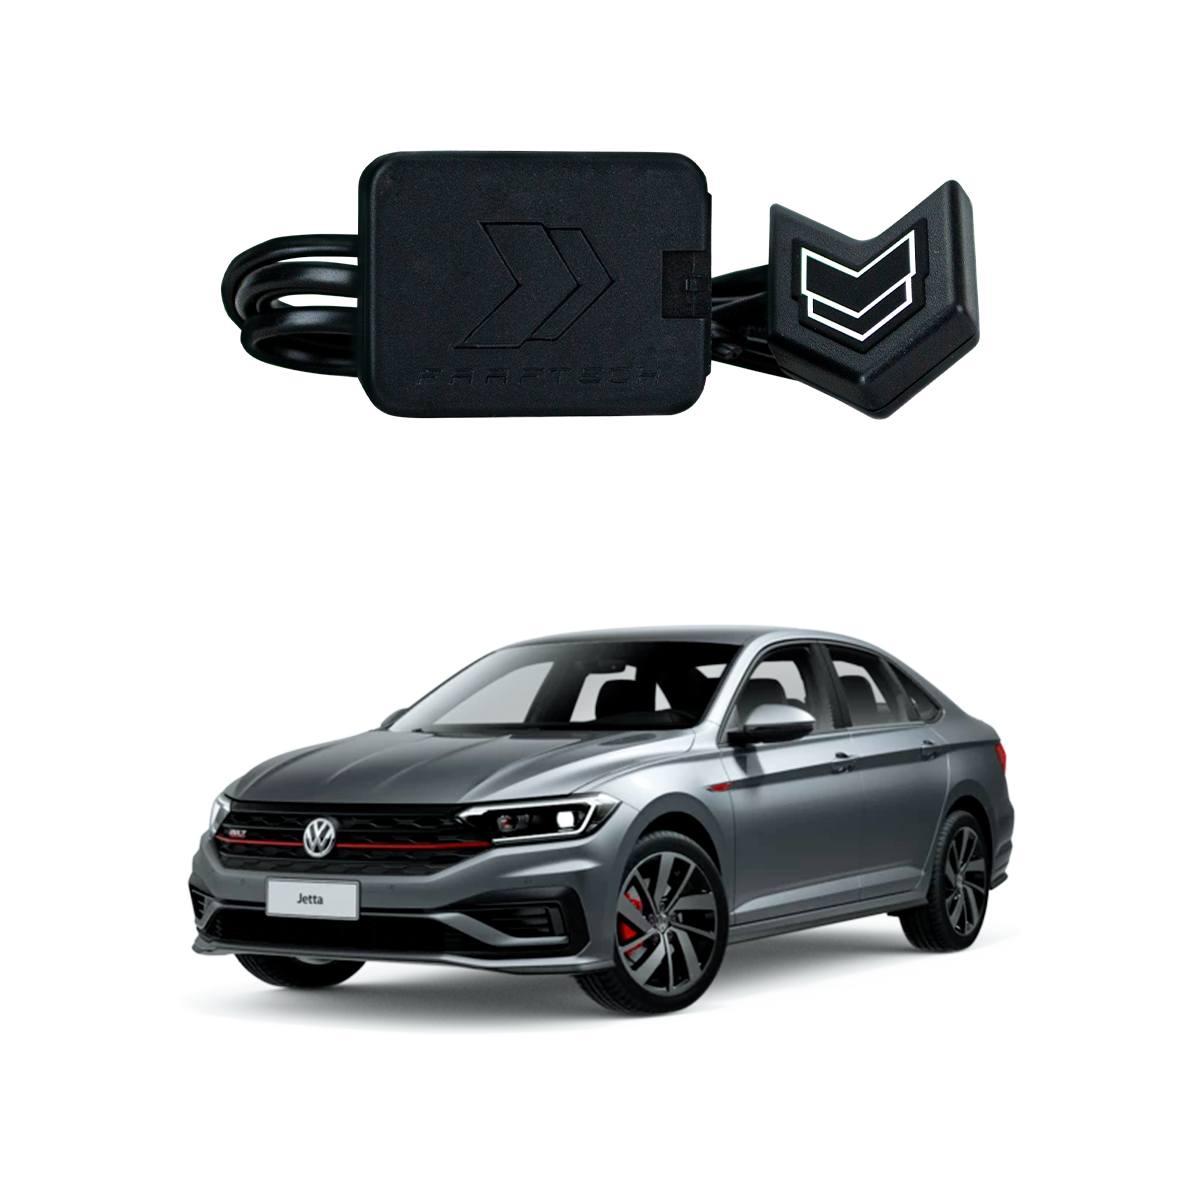 Chip de Pedal Shiftpower Para Volkswagen Jetta